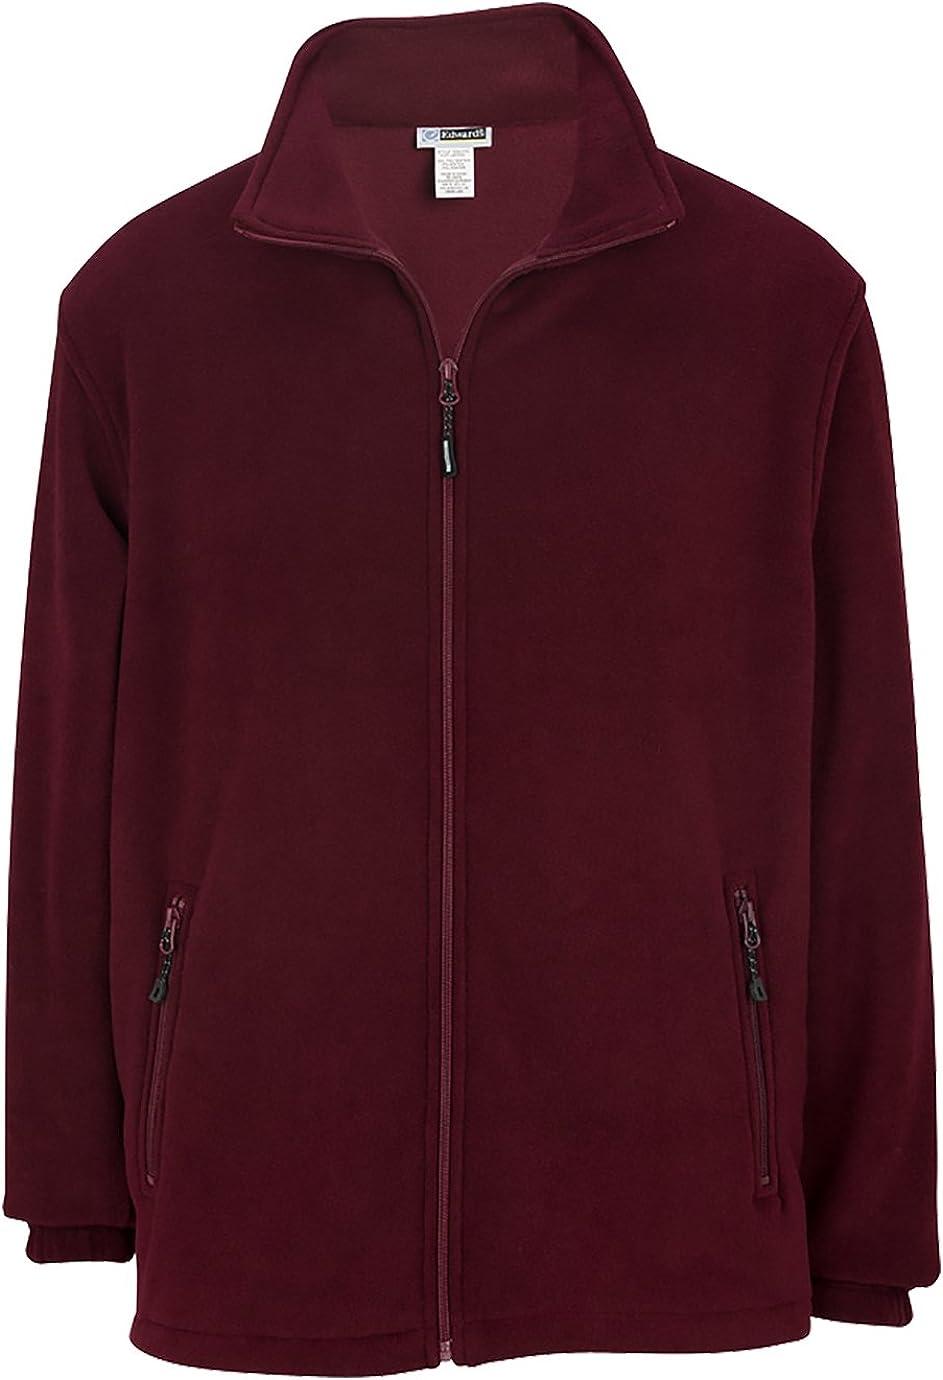 Edwards Microfleece Jacket